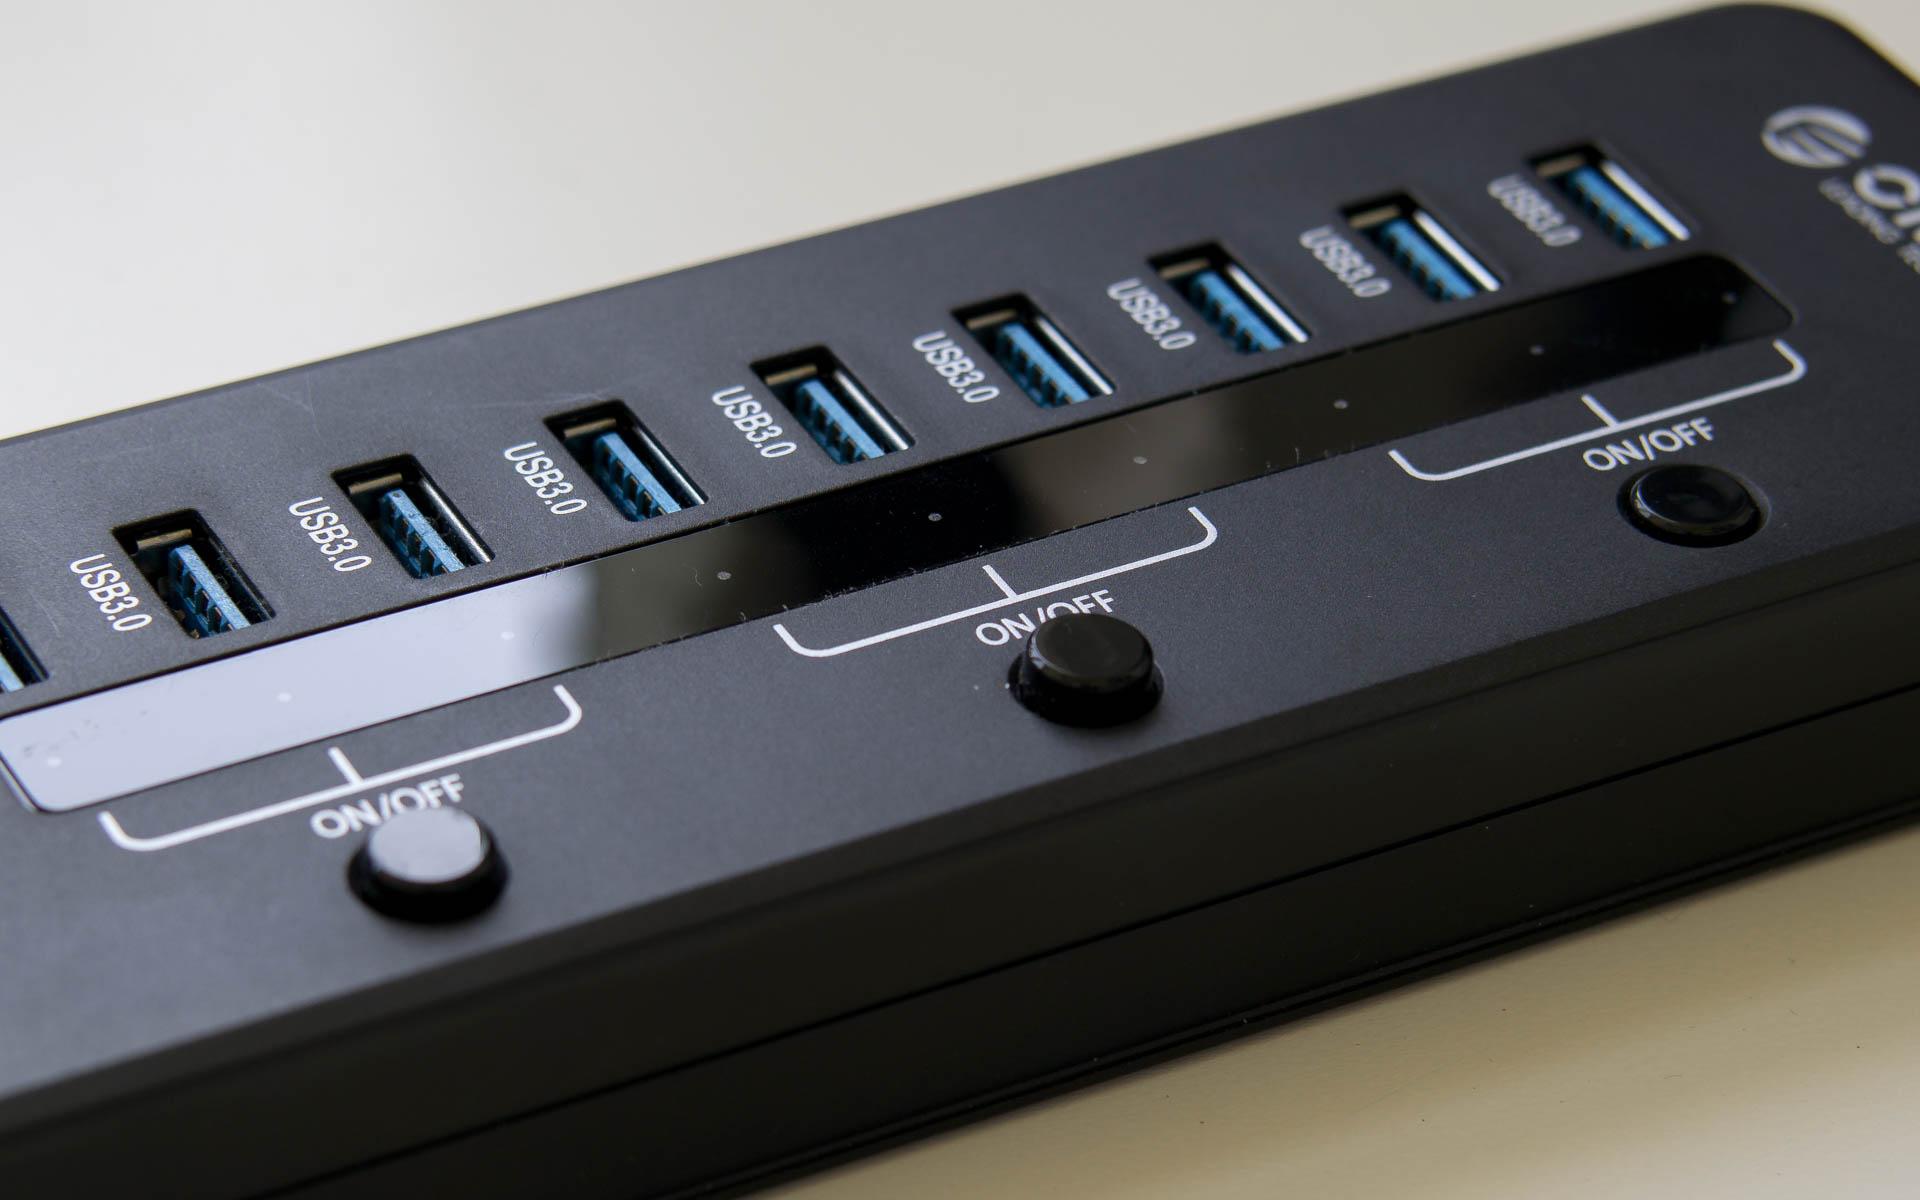 ORICO 10 port USB 3.0 HUB